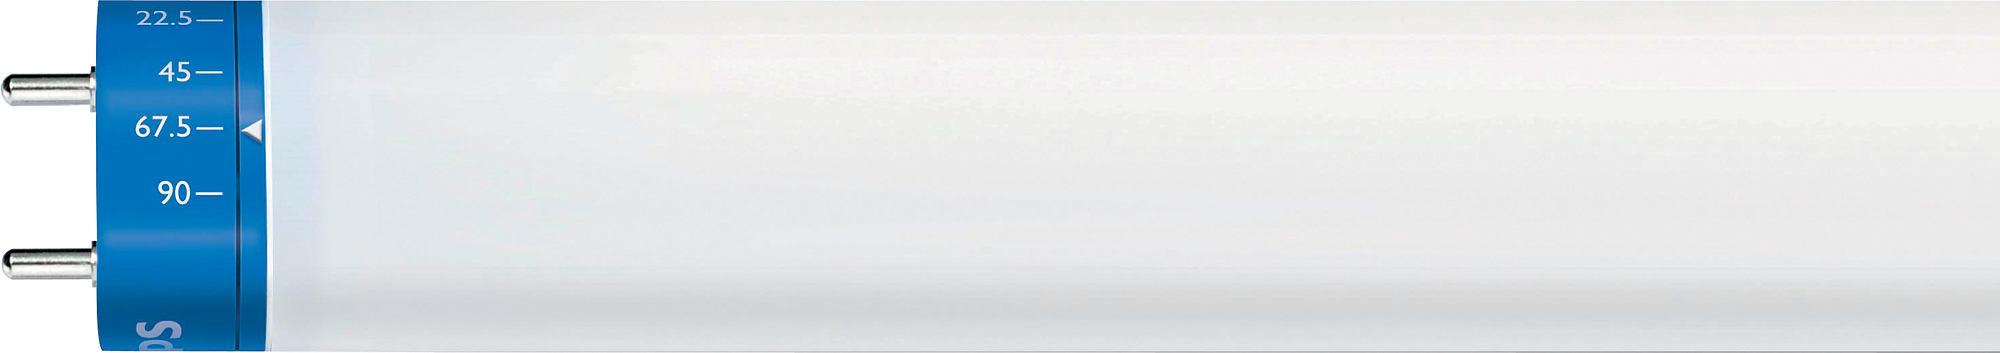 Philips MASTER LEDtube GA110 600mm 10W 840 I ROT